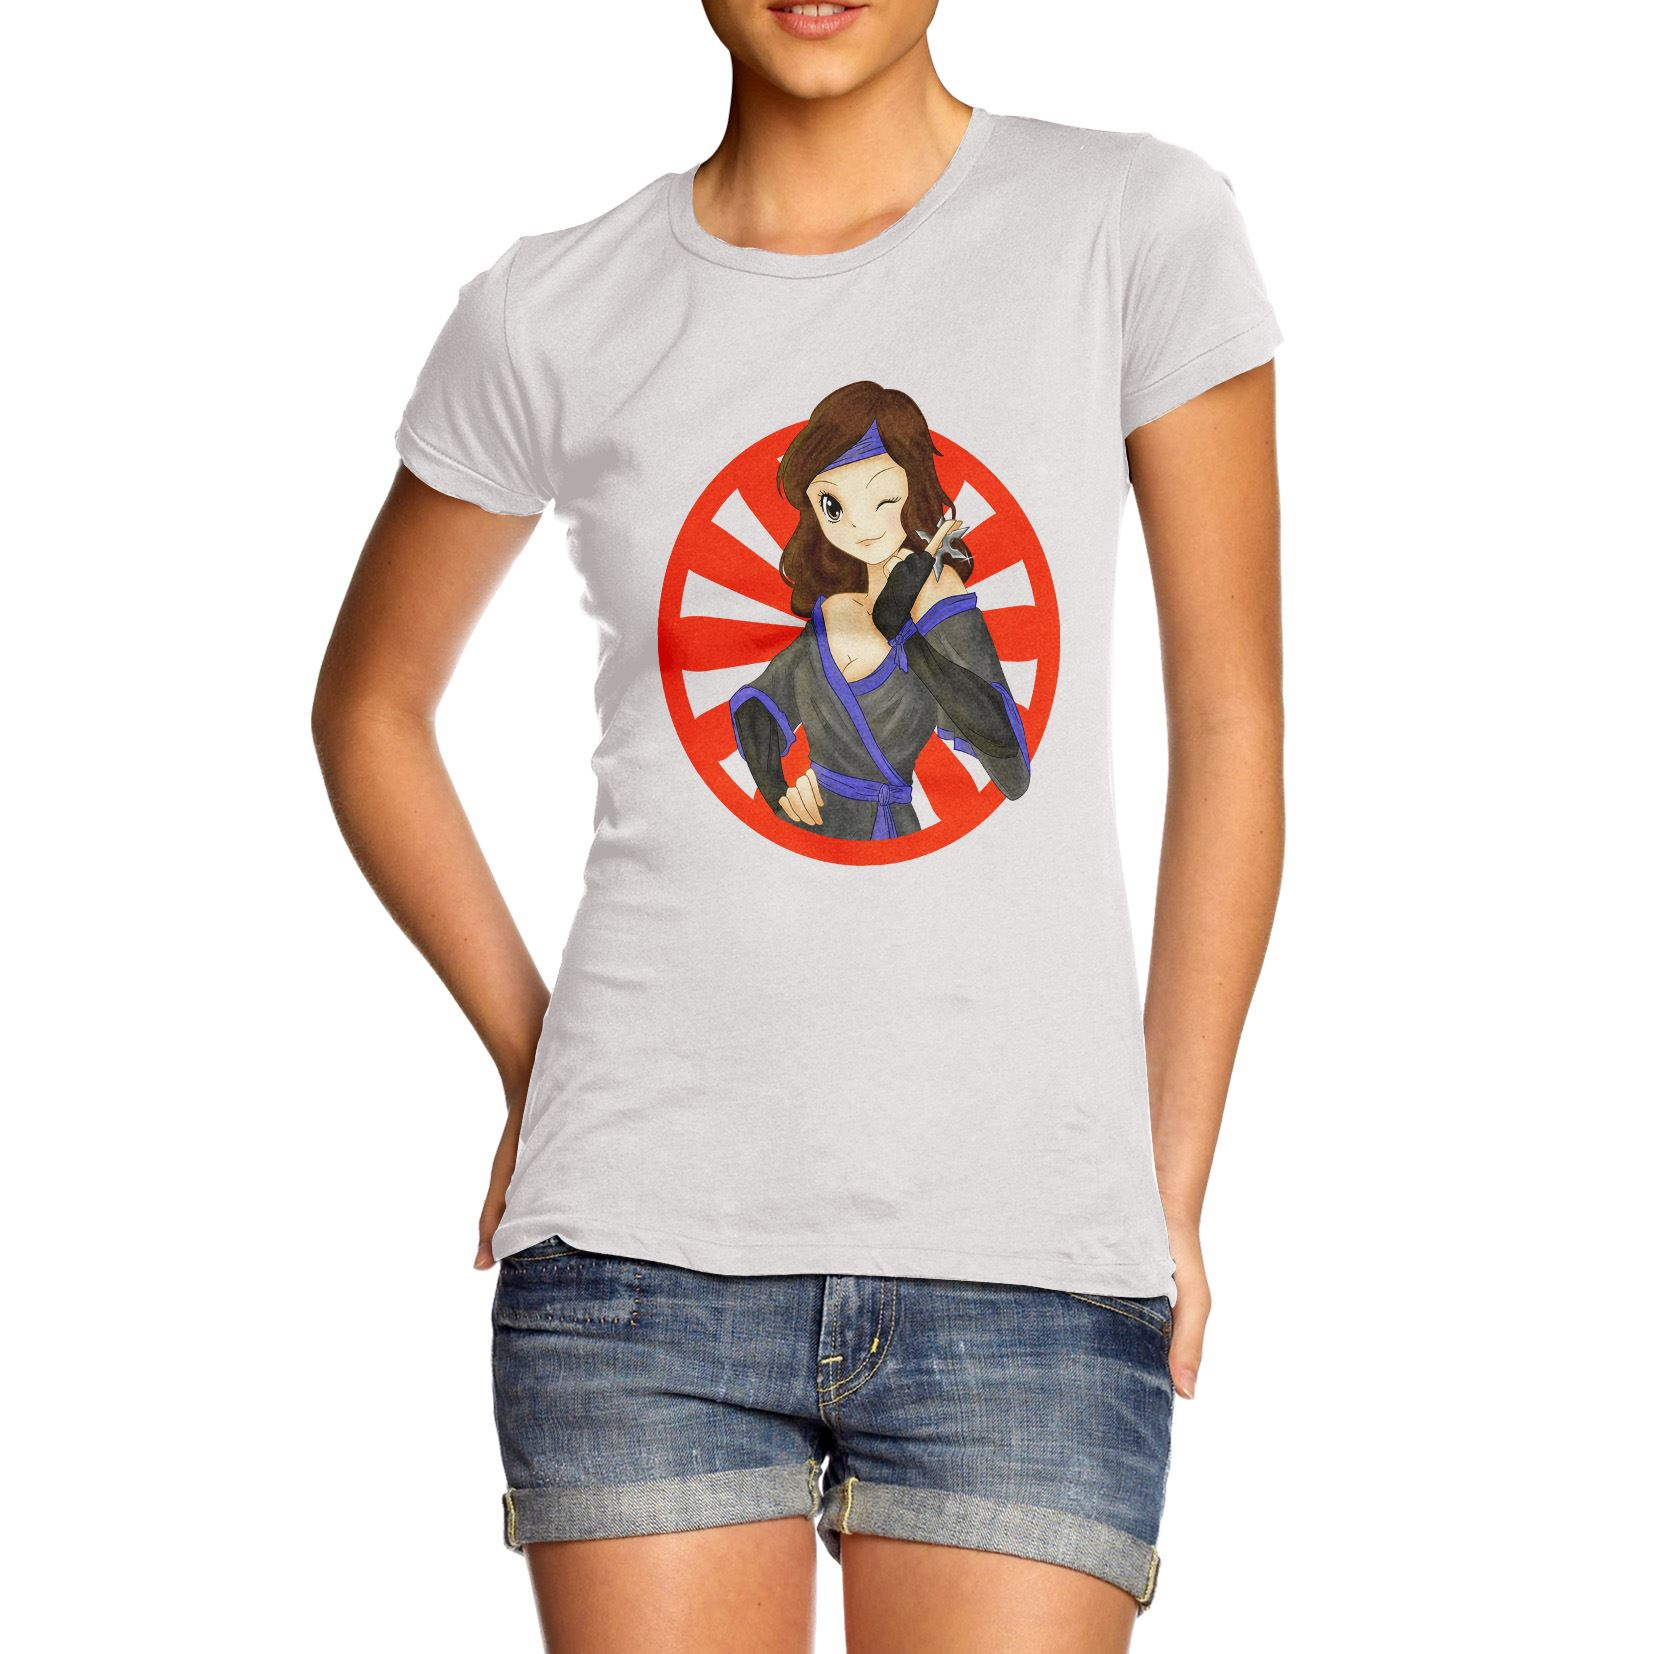 Womens Cotton Novelty Design Funny Gift Idea Anime Ninja